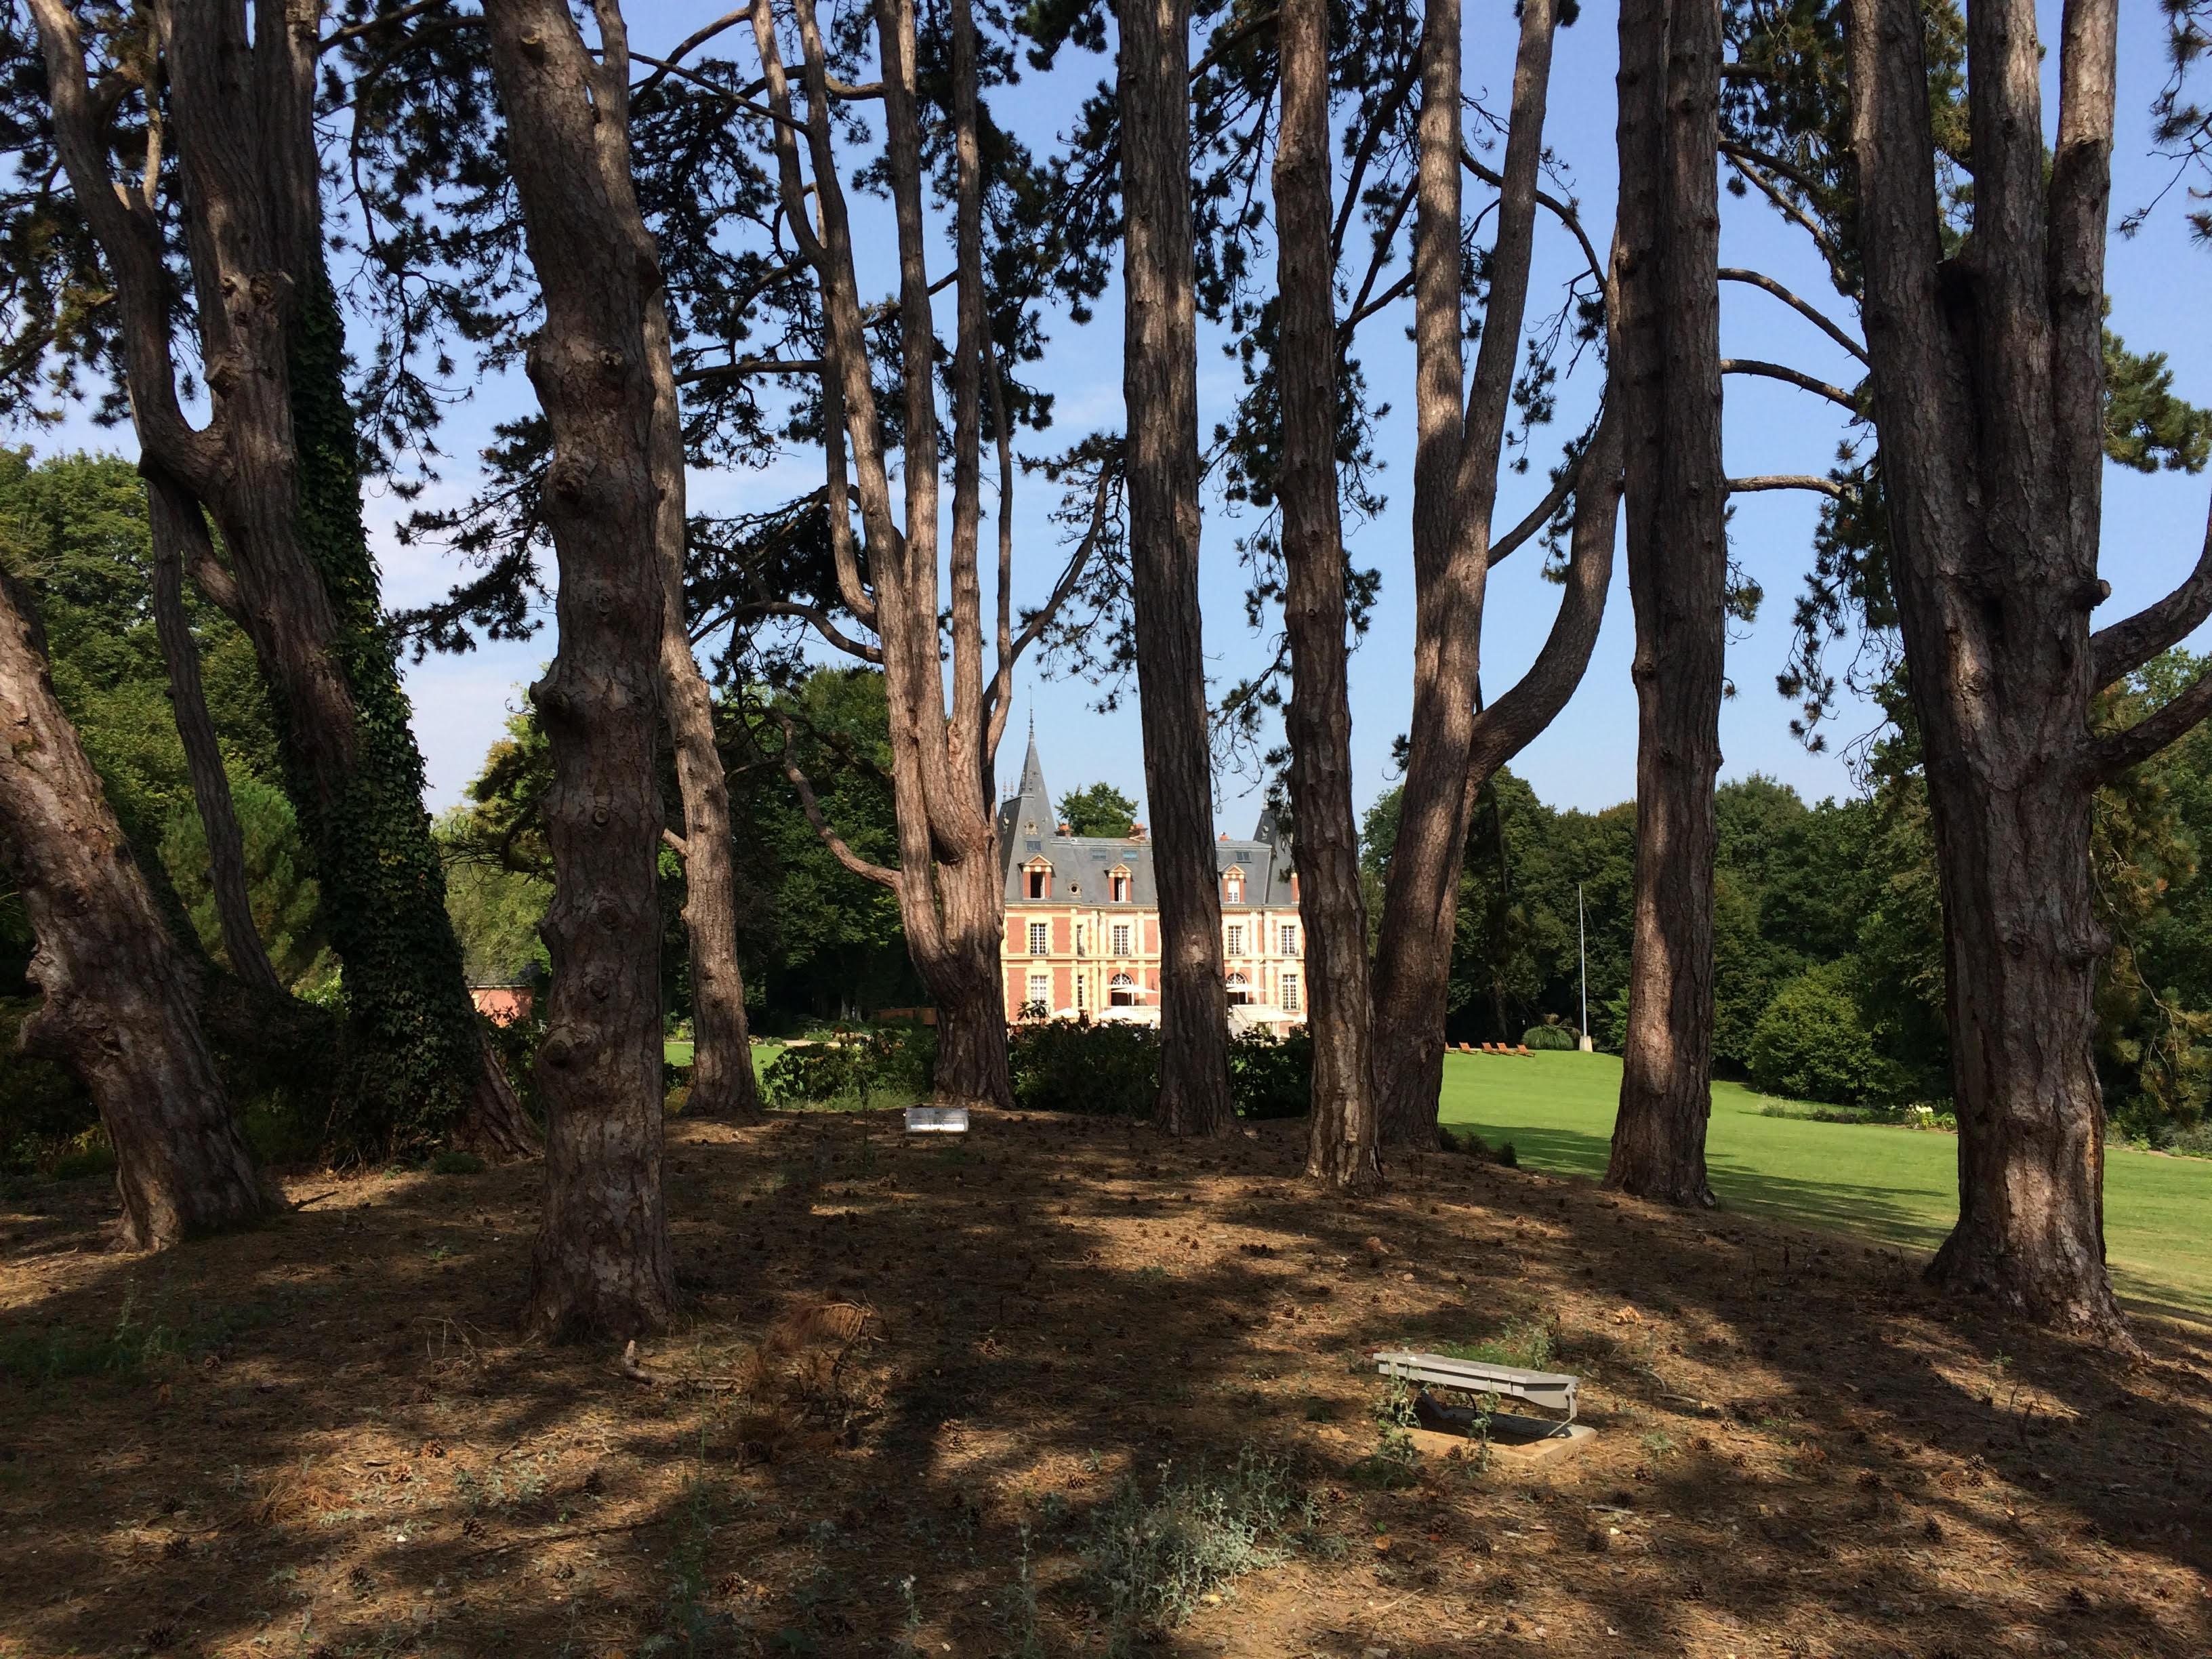 Mariage au château de Belmesnil